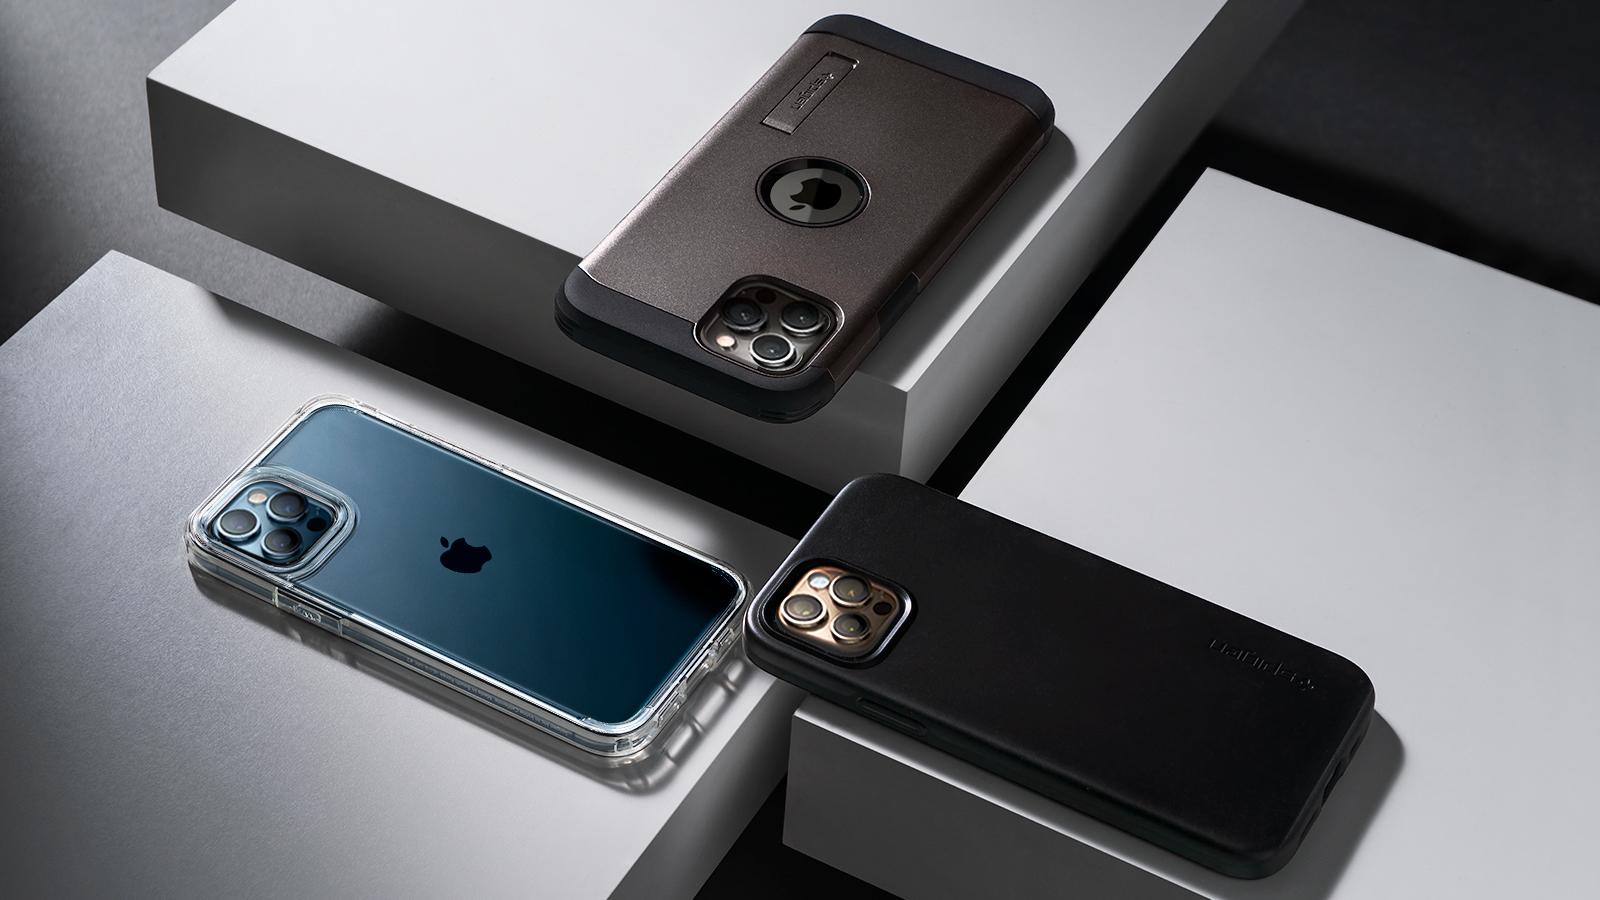 Suit up with Spigen for iPhone 12 – BGR